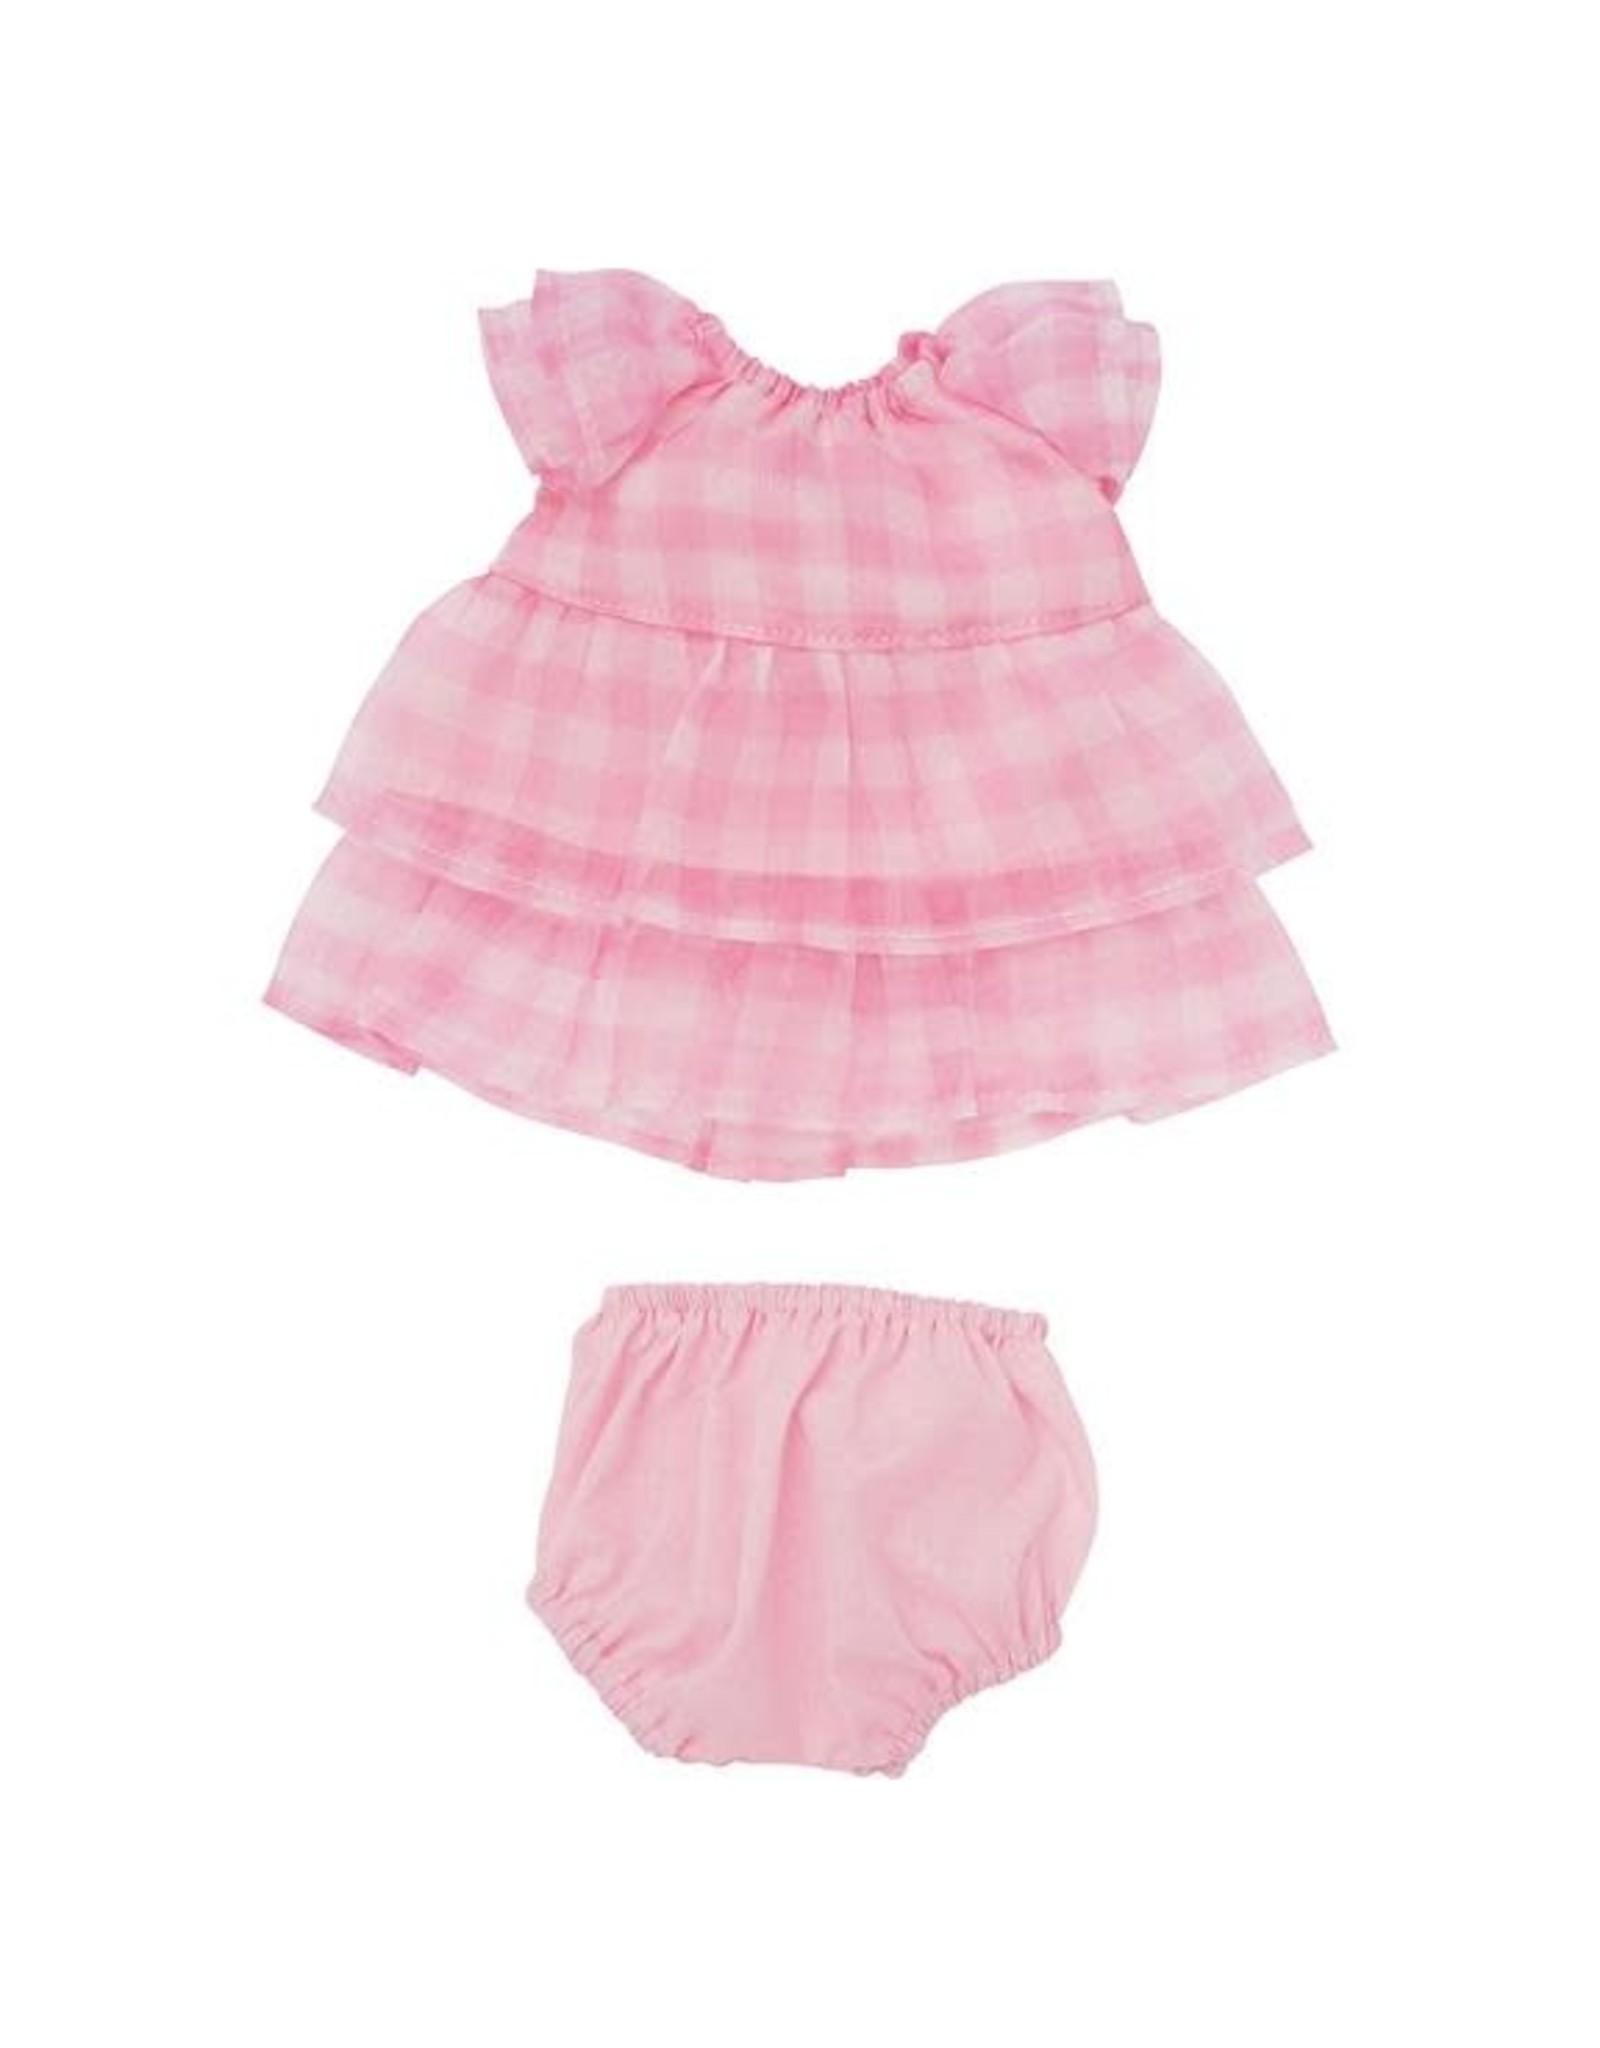 Baby Stella Baby Stella Pretty in Pink